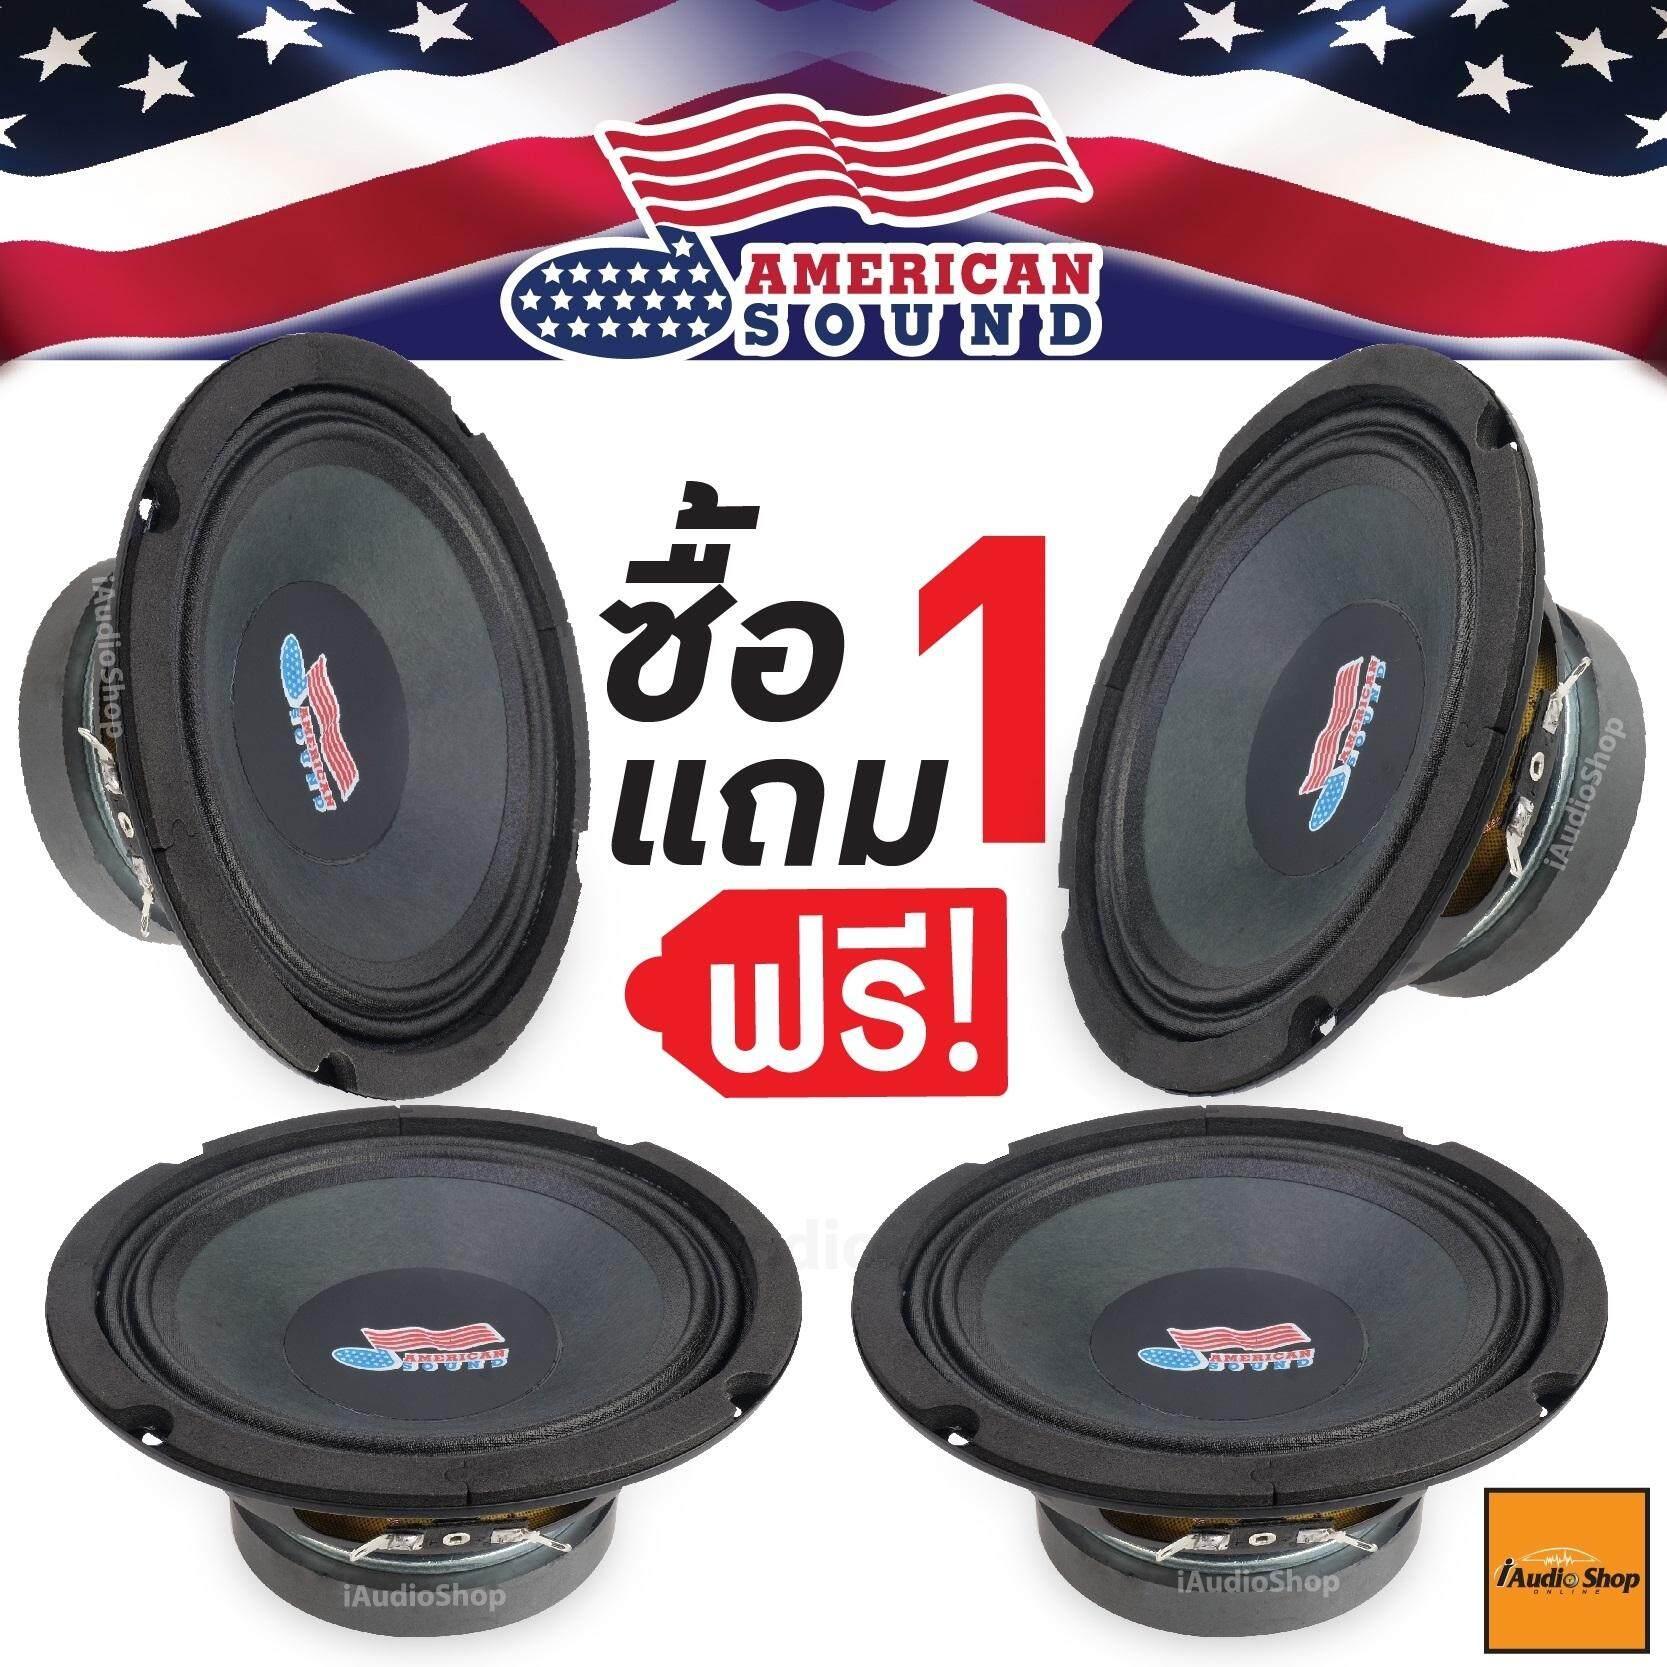 American Sound ซื้อ1แถม1 ลำโพง ลำโพงเสียงกลาง ขนาด6 5นิ้ว Ams 660Lmtจำนวน 1คู่ แถมฟรี ลำโพงเสียงกลาง Ams 660Lmt เพิ่มอีก 1คู่ ใหม่ล่าสุด